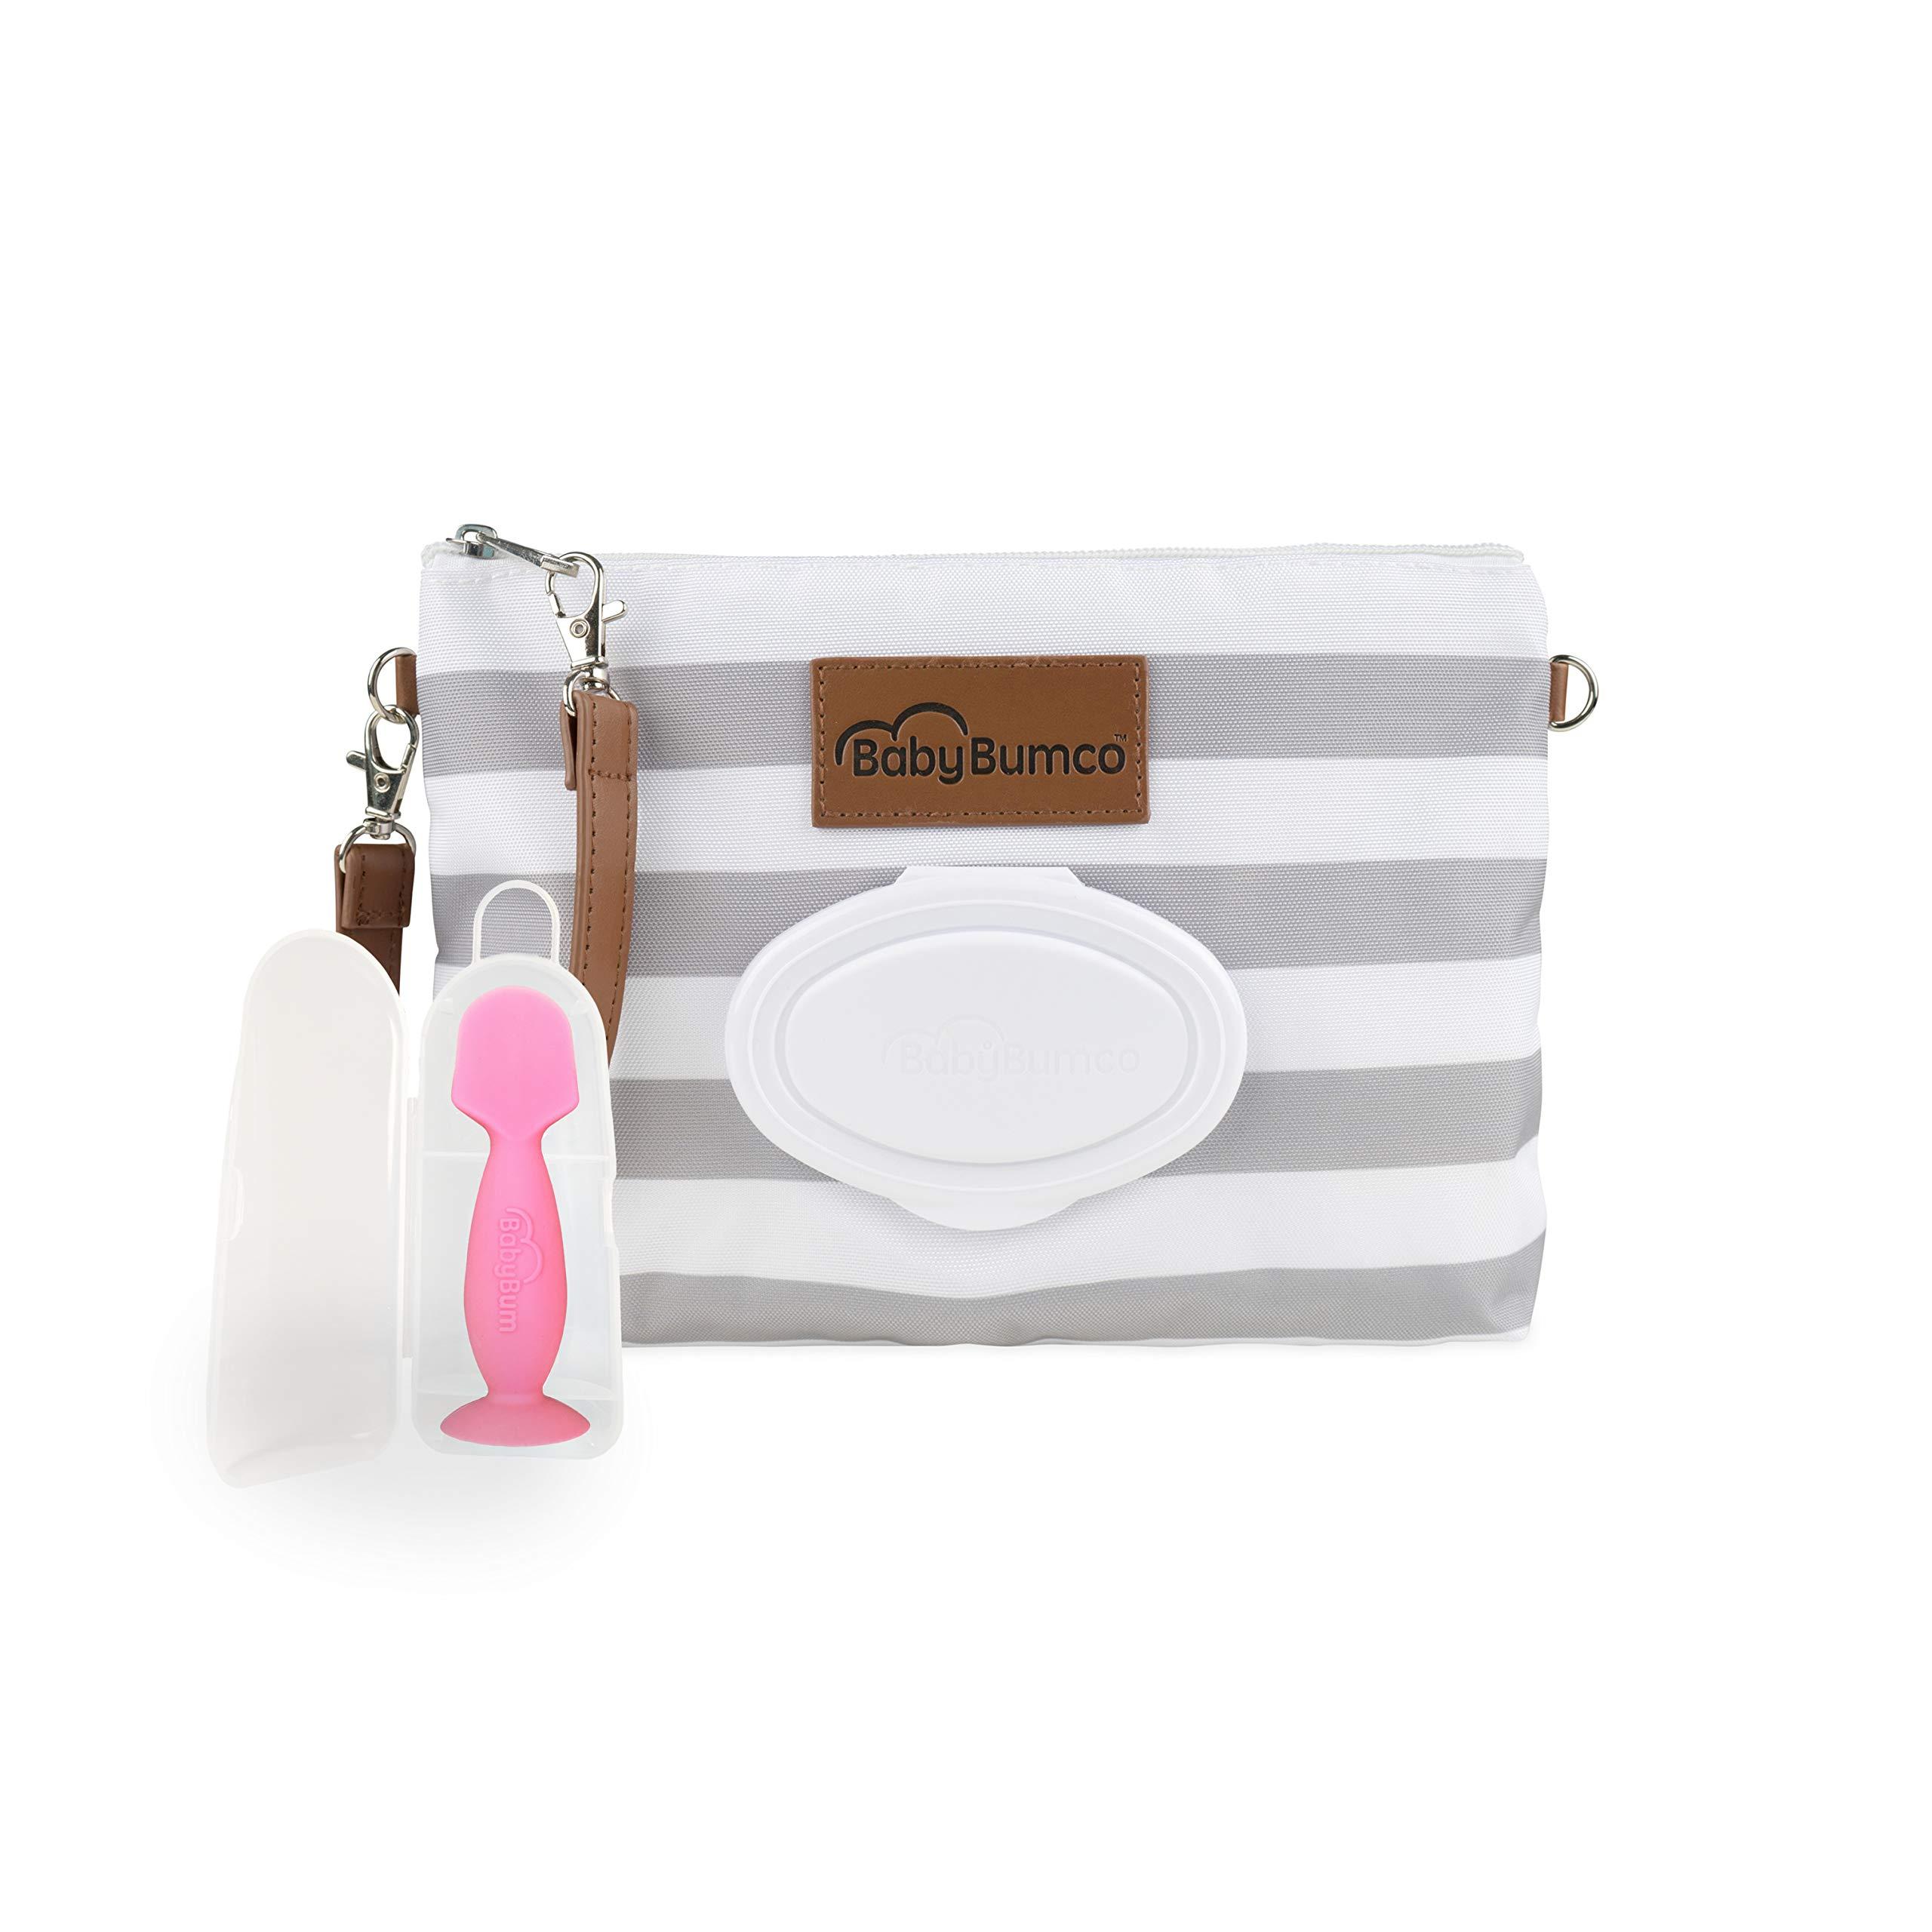 BabyBum Diaper Clutch + Mini Diaper Cream Brush - Travel Essentials (Gray + Pink)